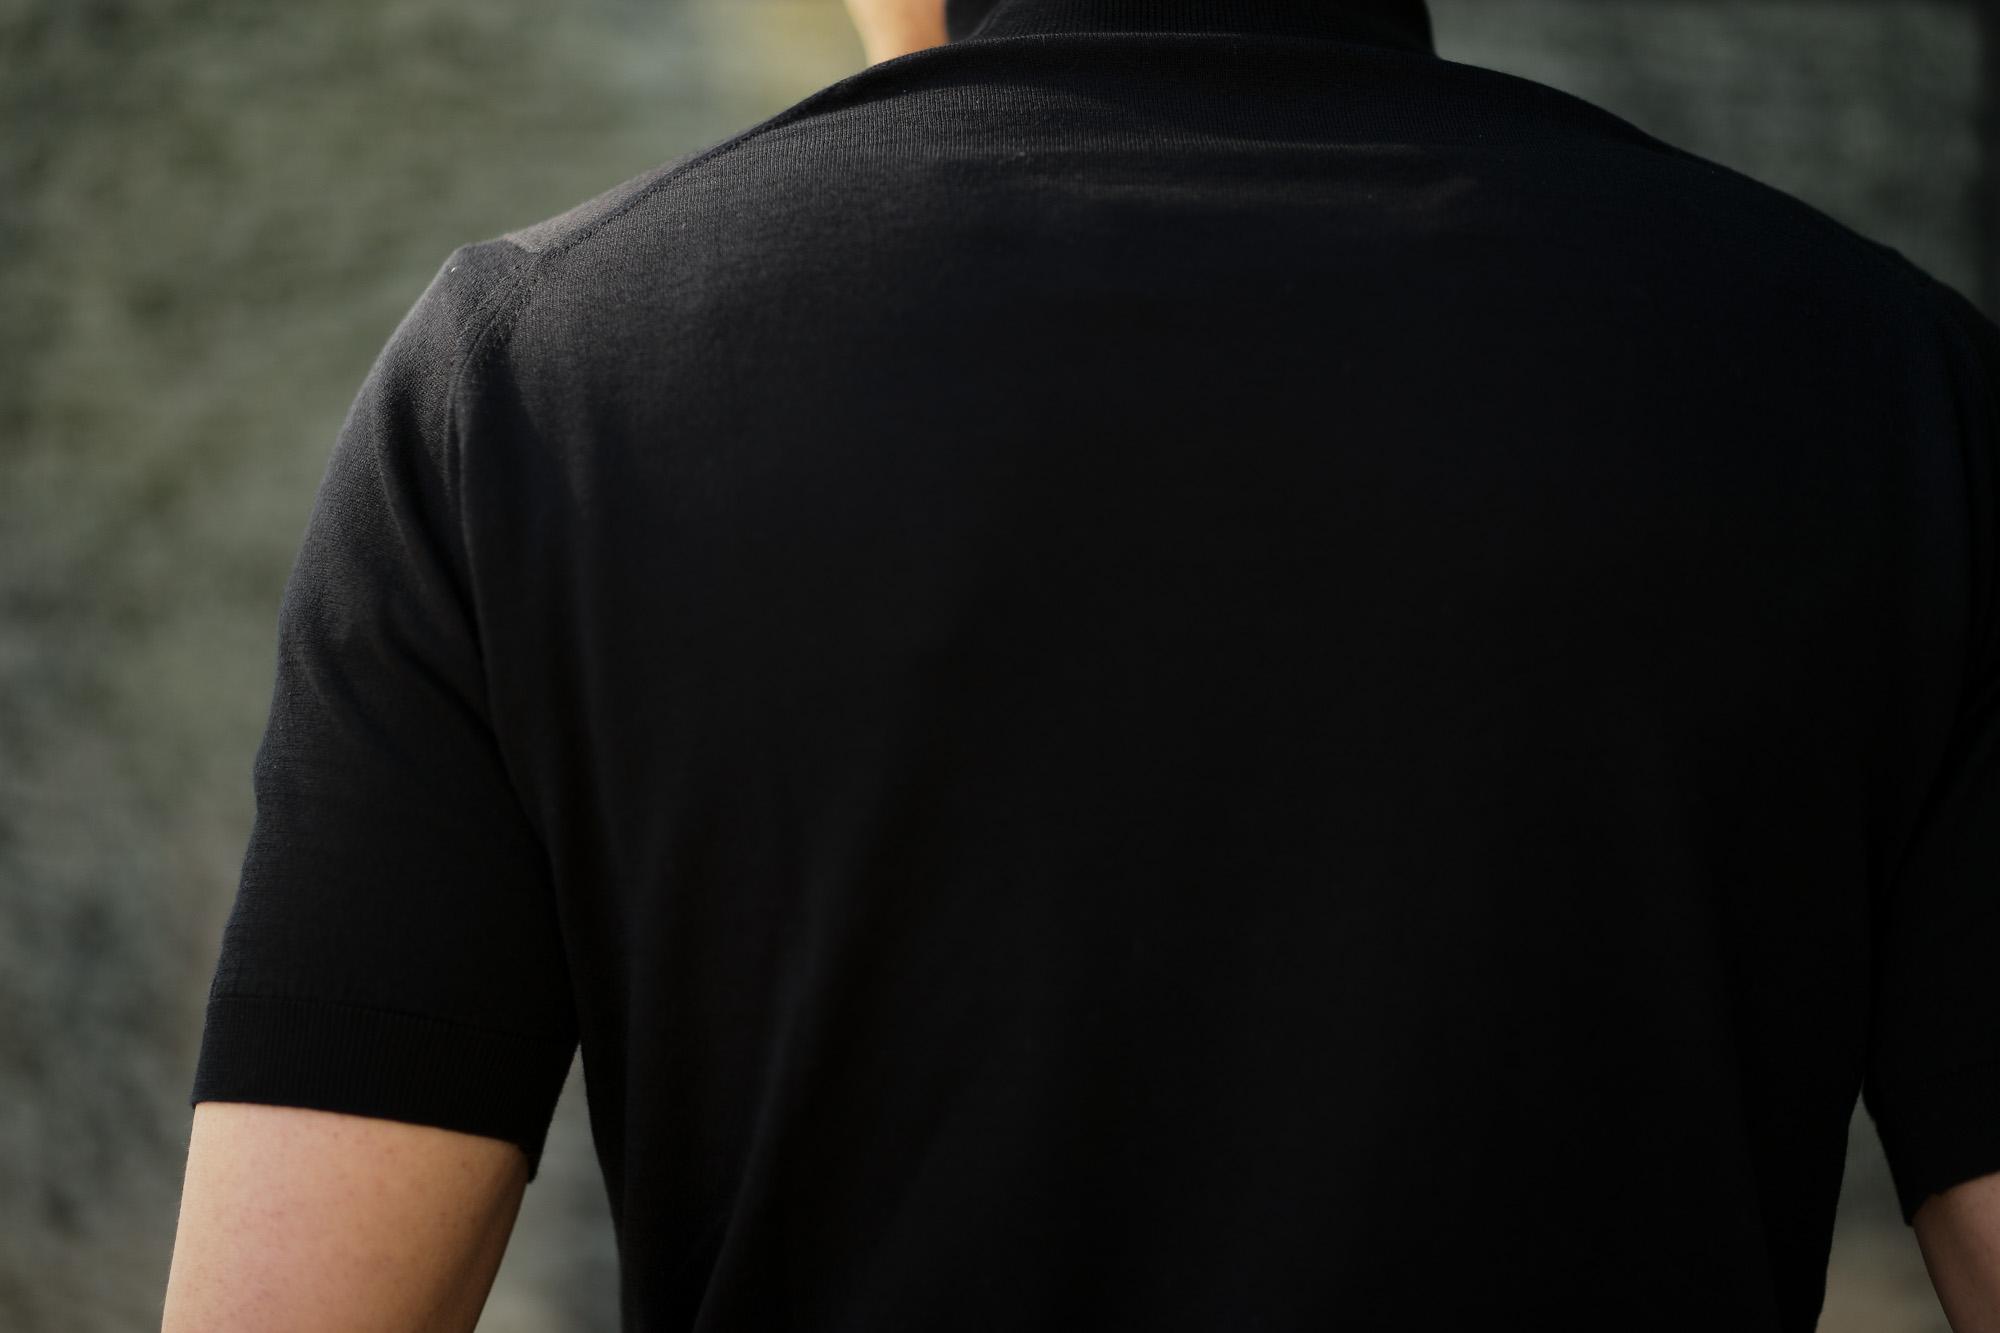 JOHN SMEDLEY (ジョンスメドレー) S3813 Mock neck T-shirt SEA ISLAND COTTON (シーアイランドコットン) コットンニット モックネック Tシャツ BLACK (ブラック) Made in England (イギリス製) 2019 春夏新作 johnsmedley 愛知 名古屋 altoediritto アルトエデリット